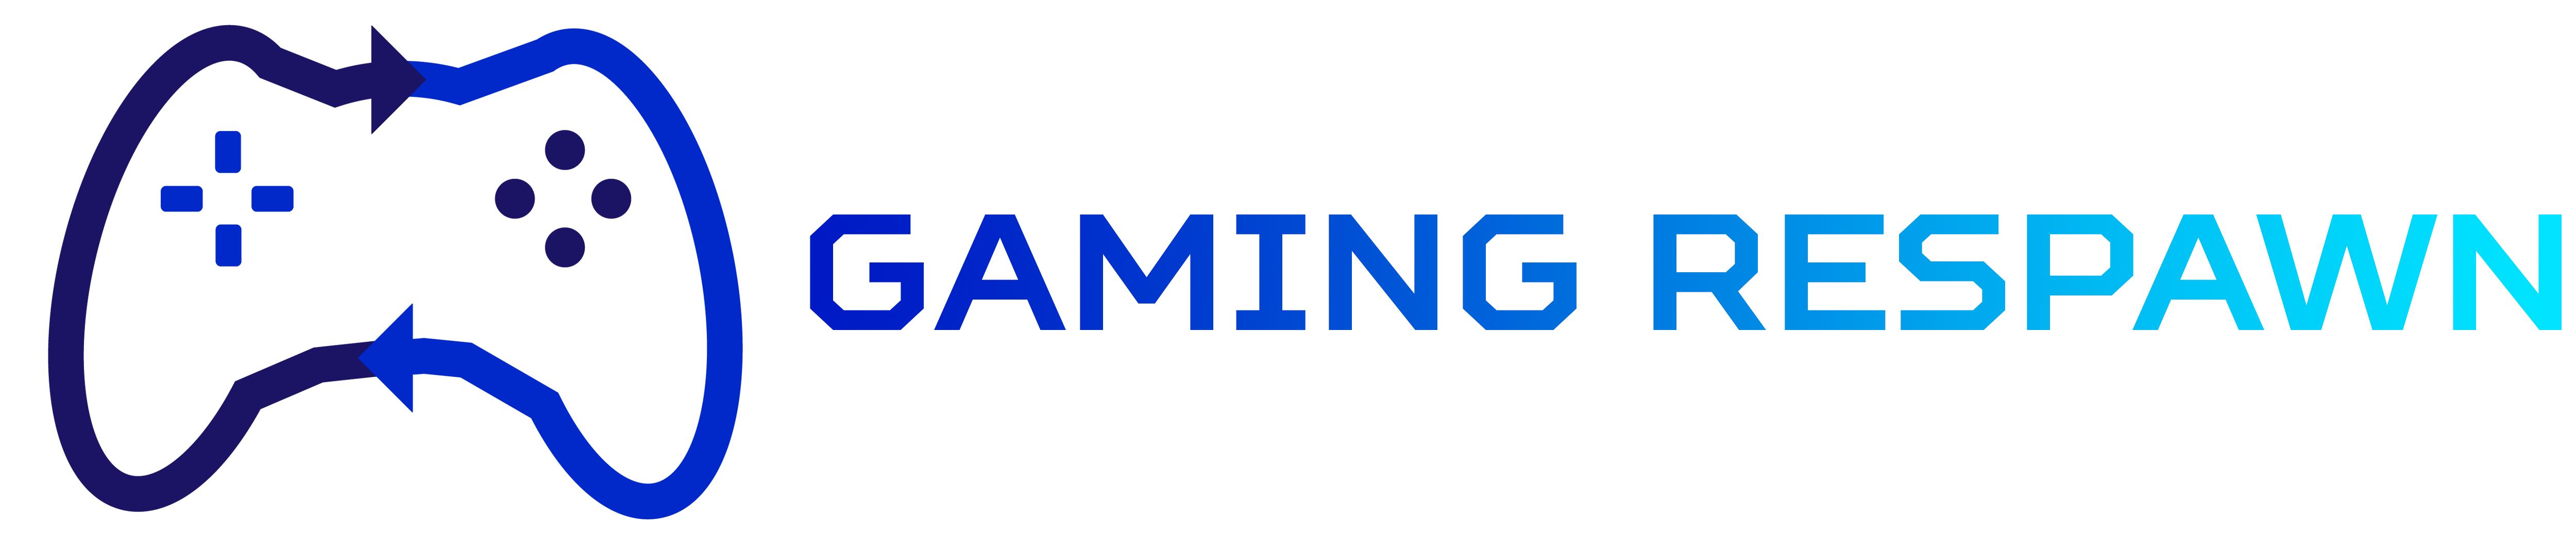 Gaming Respawn